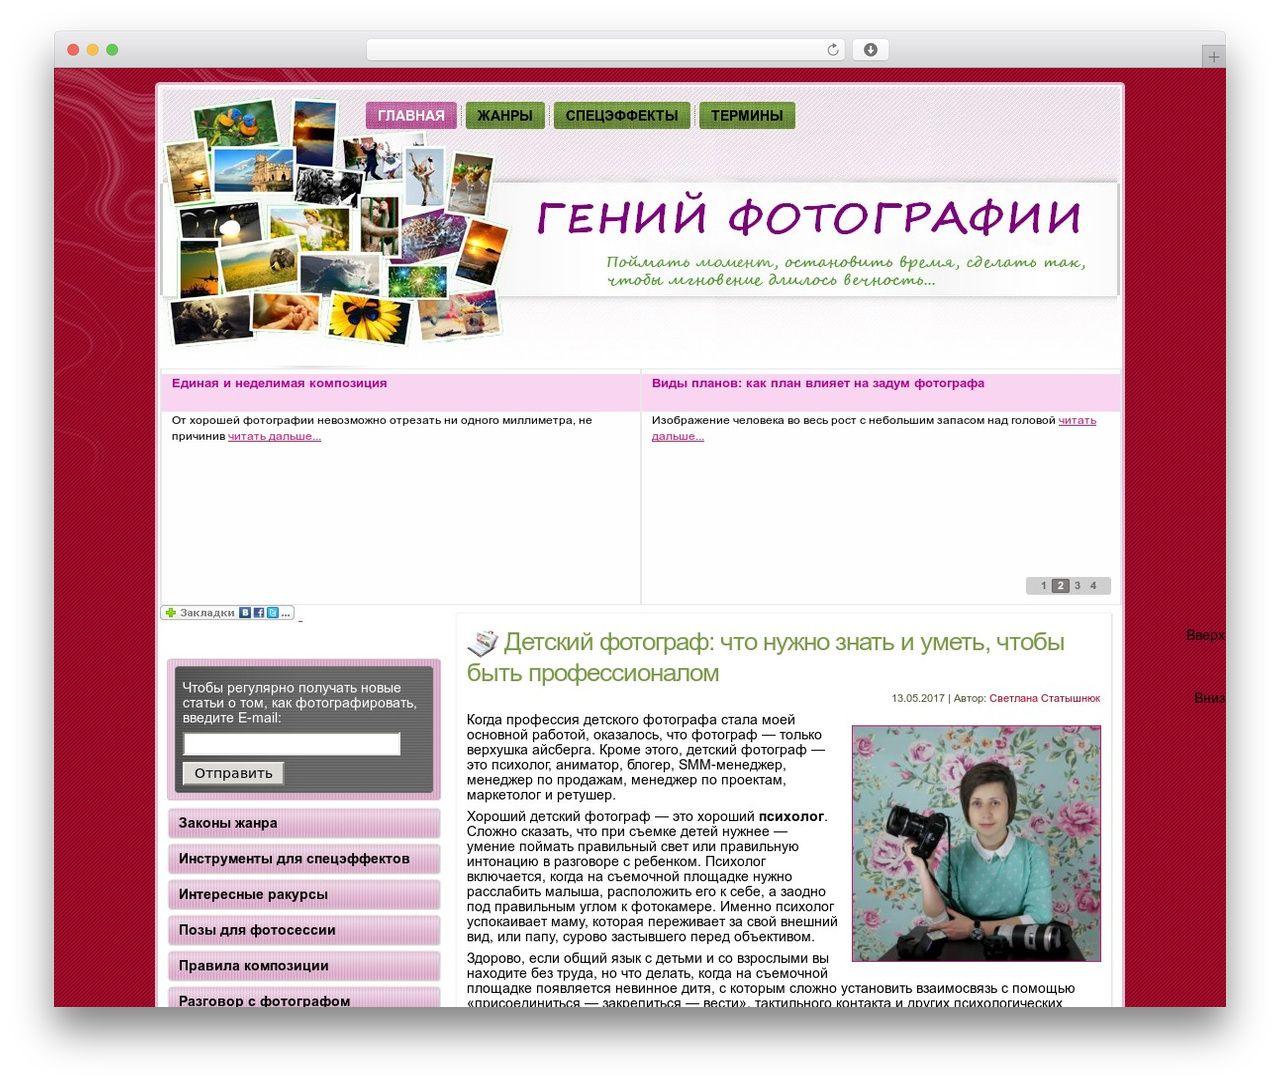 WordPress theme artphoto_fleximag - kak-fotografirovat.com